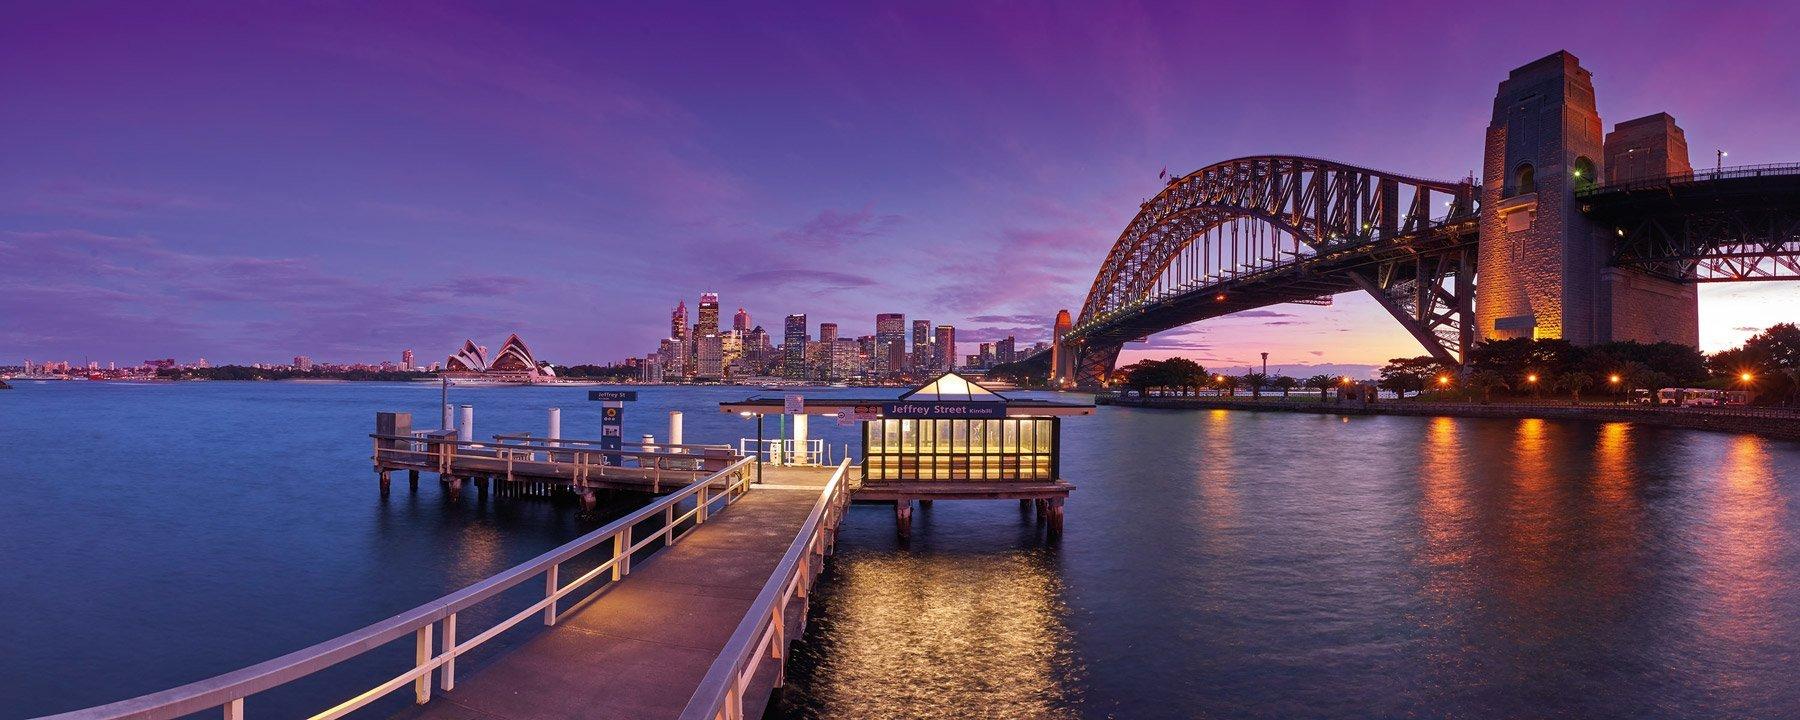 Twilight Calm, Sydney Harbour